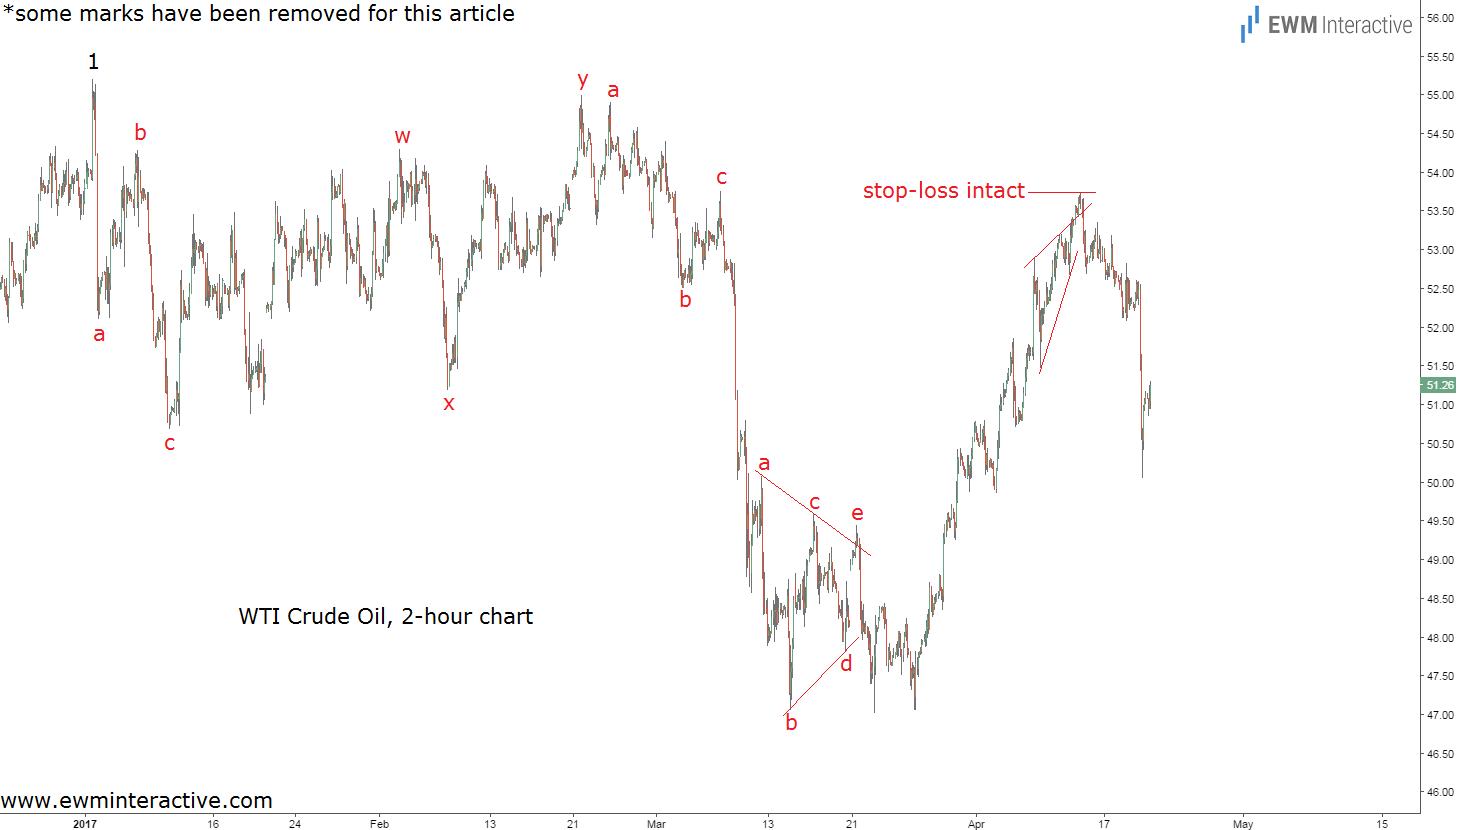 wti crude oil prices elliott wave chart updated